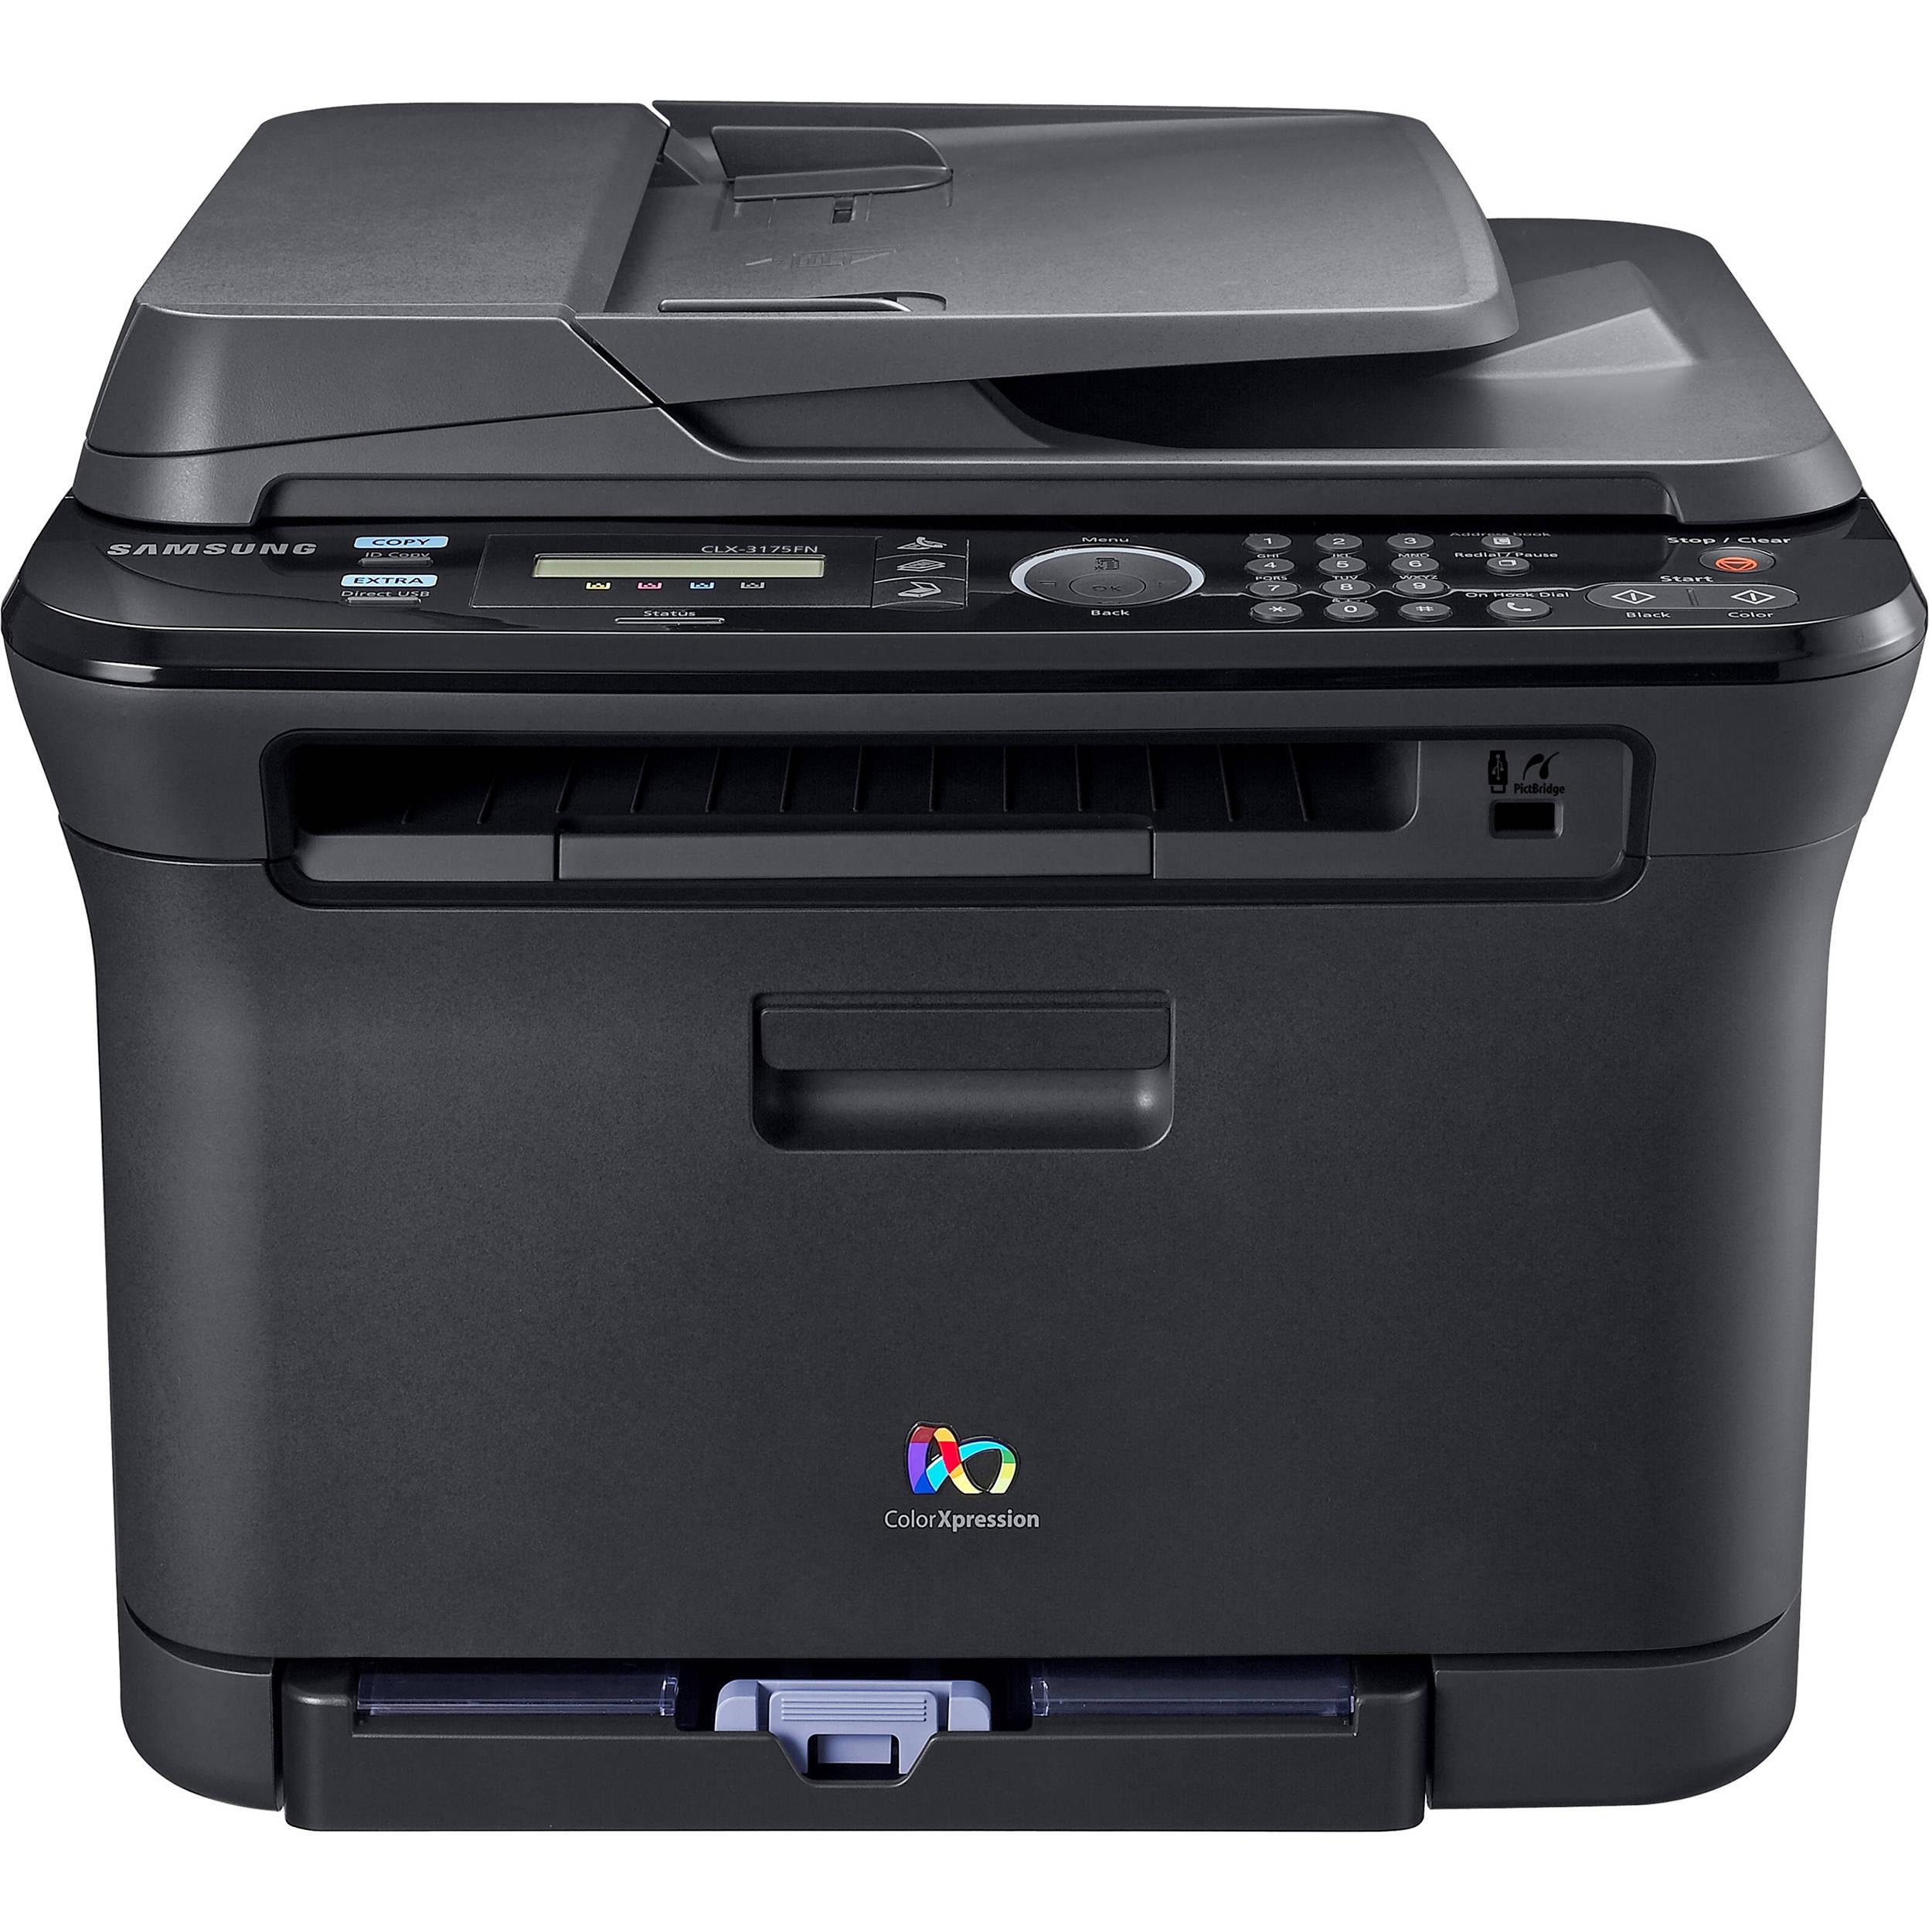 staples fax machine service cost